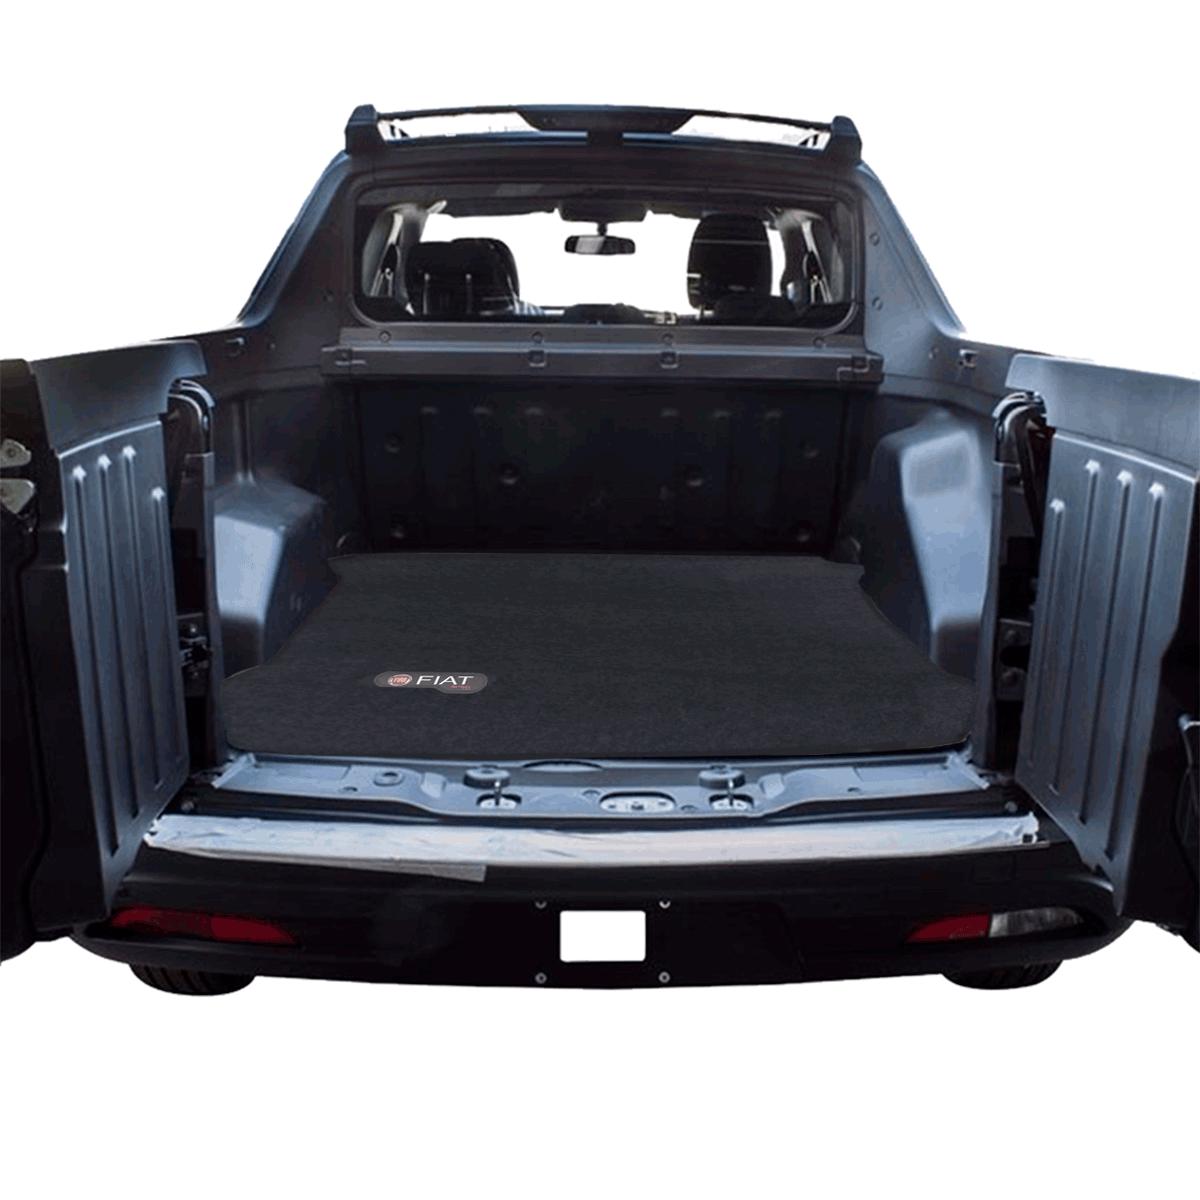 Tapete De Carpete Premium Caçamba Traseira Fiat Toro